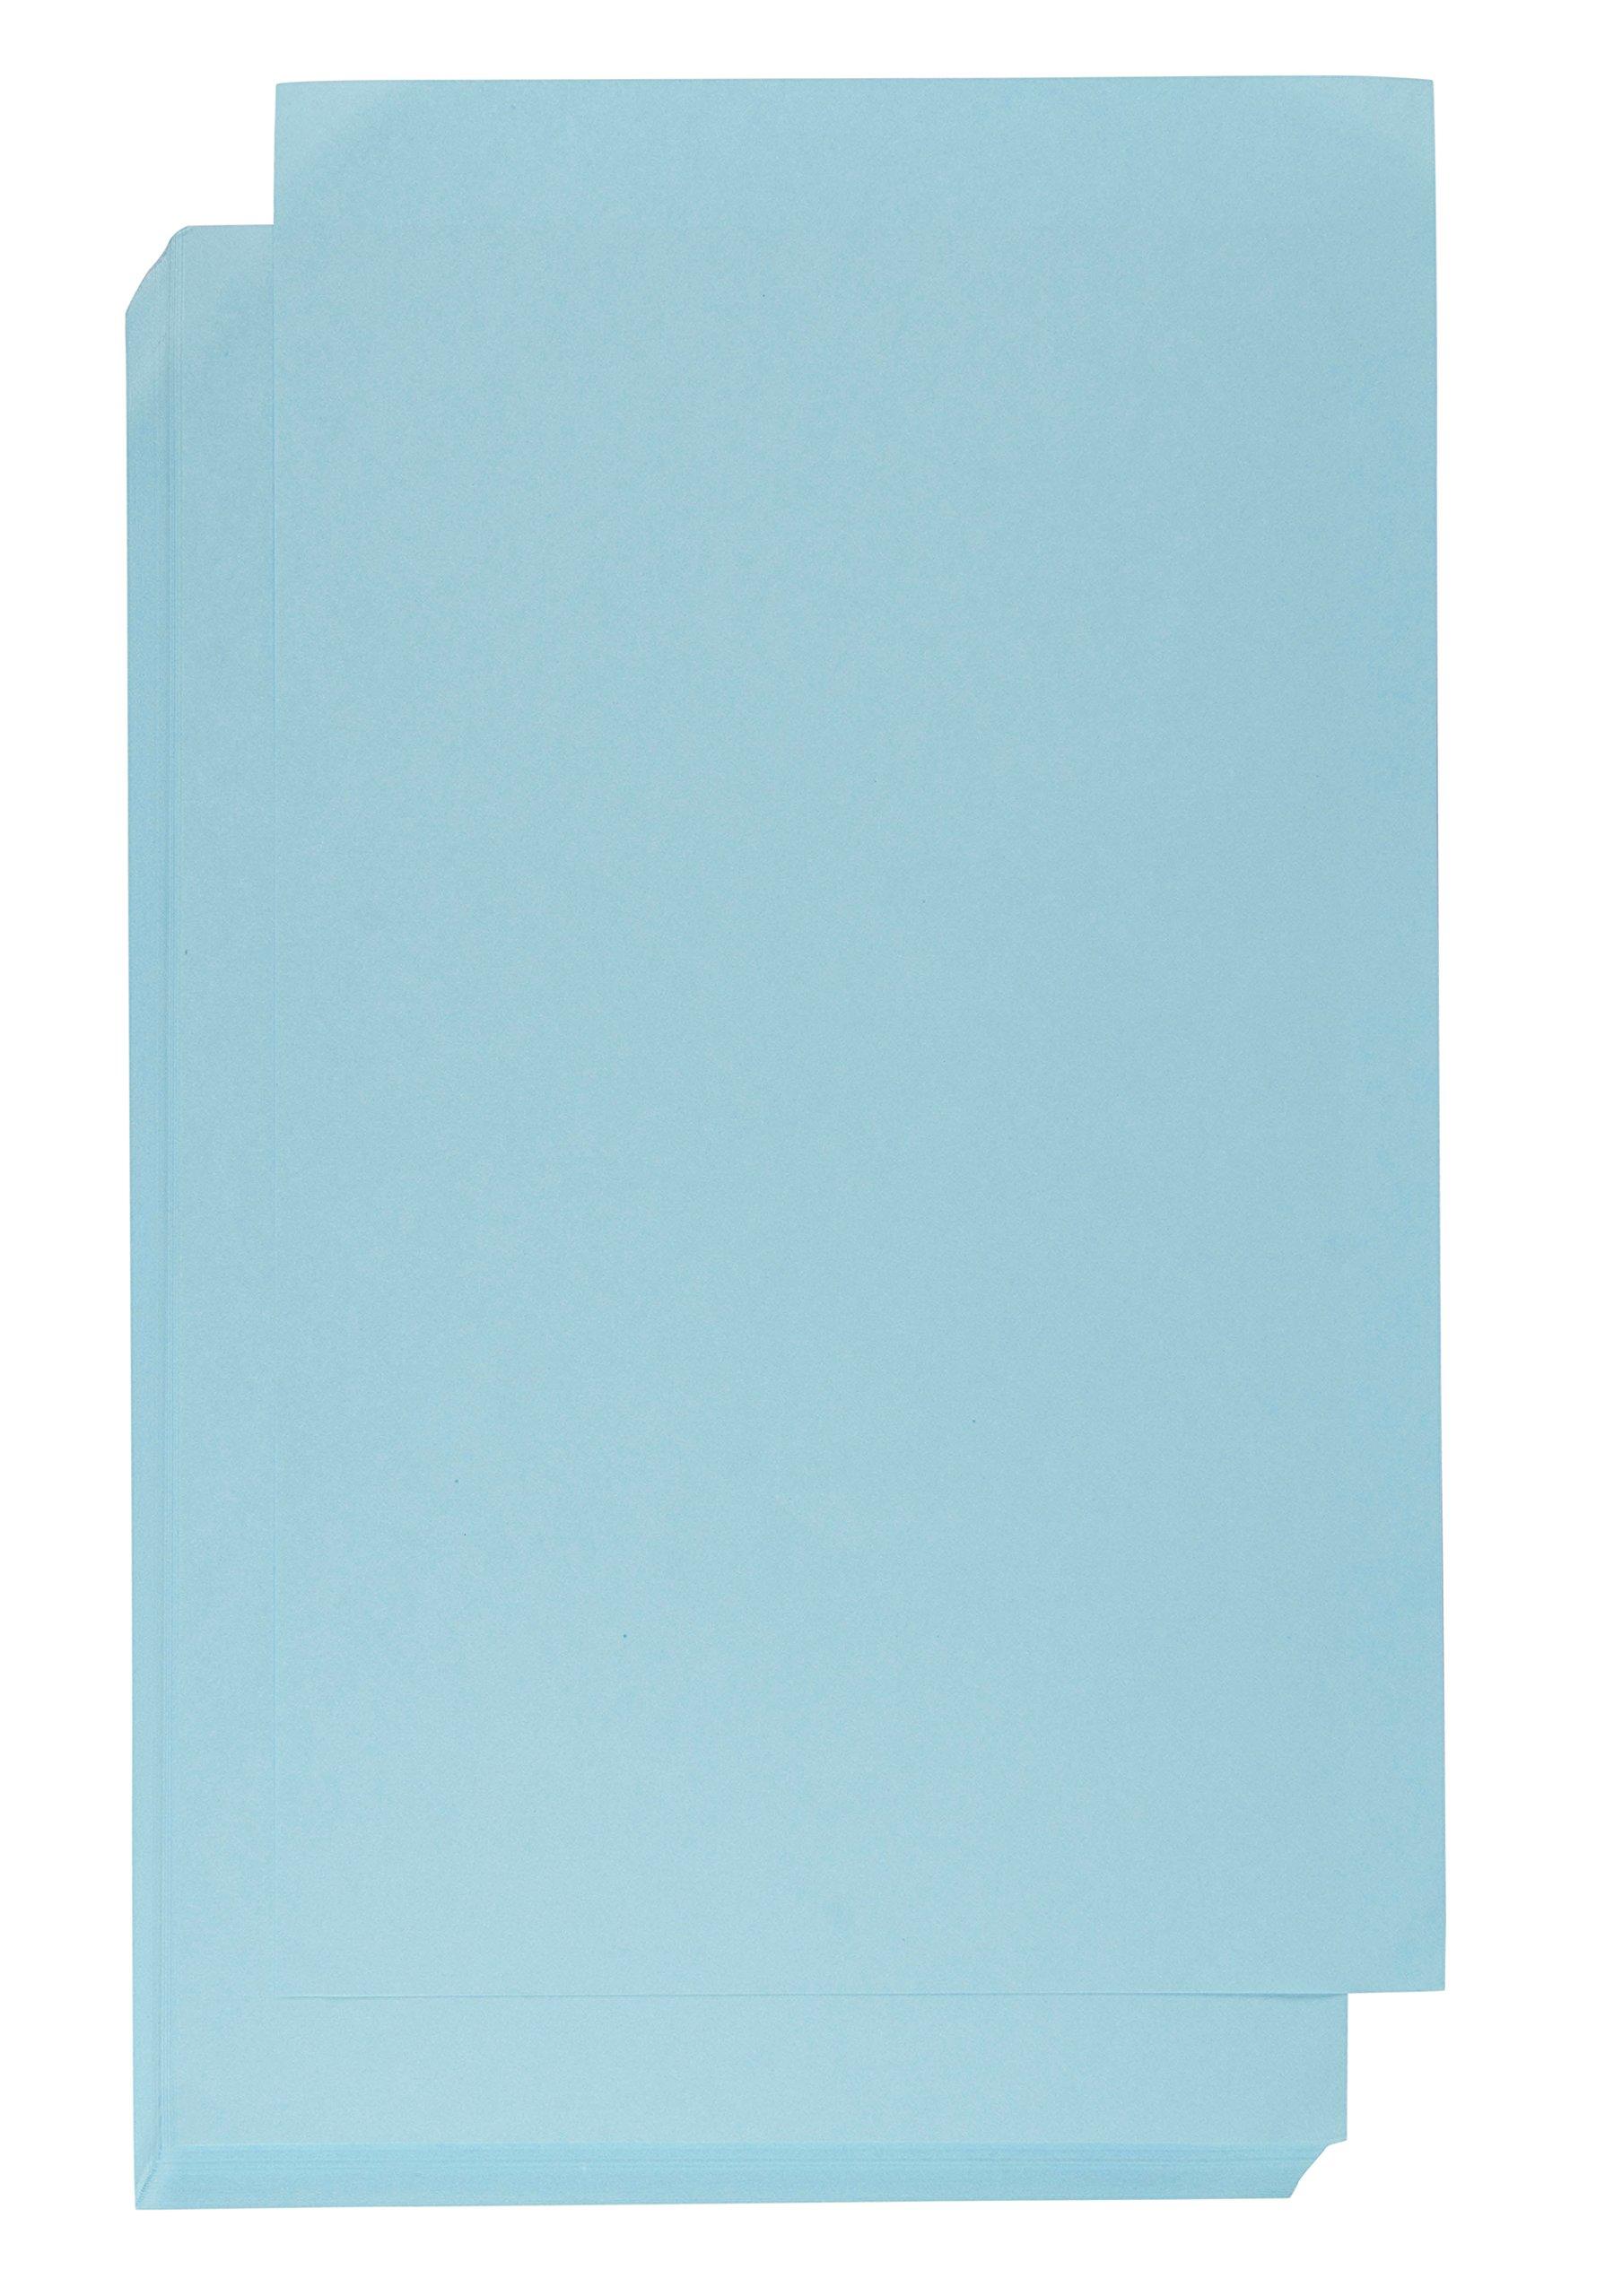 Cardstock Paper - 60-Count 8.5 x 14 Legal Size Paper for DIY Craft Project, Scrapbooking, Menu, Program, Document, Inkjet and Laser Printer Compatible, 150GSM, Blue